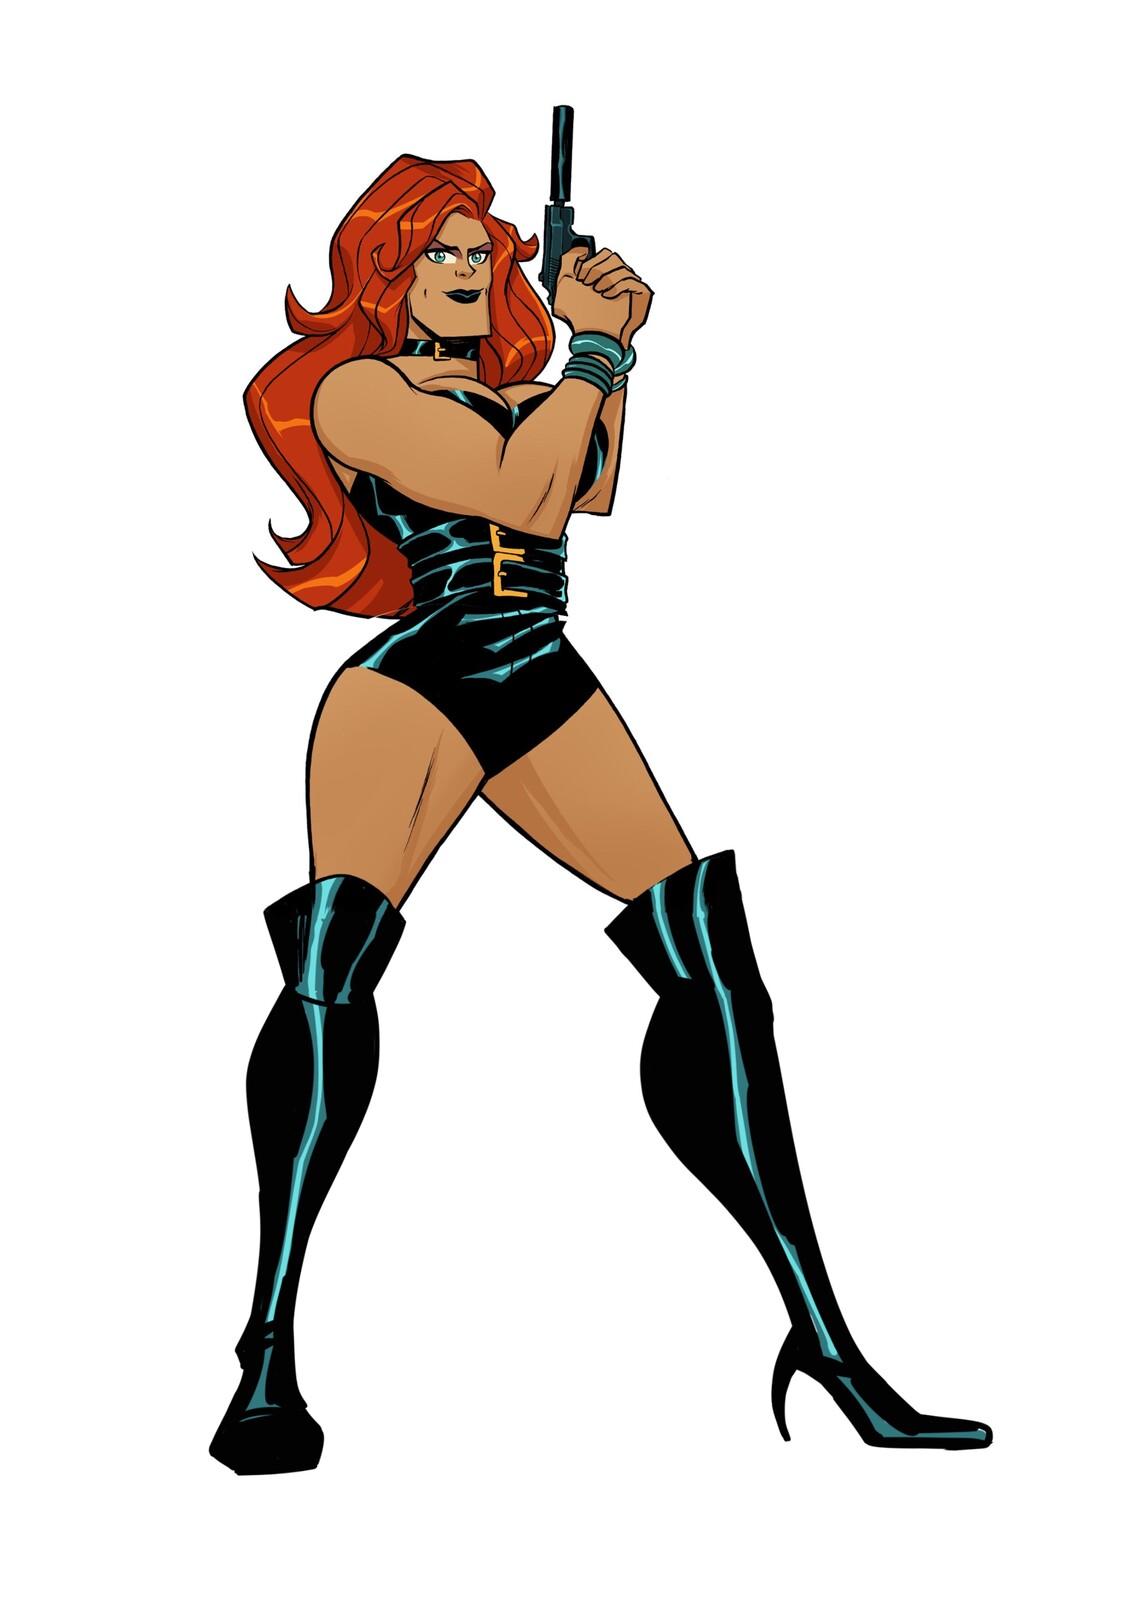 Original Character by Thobias Daneluz